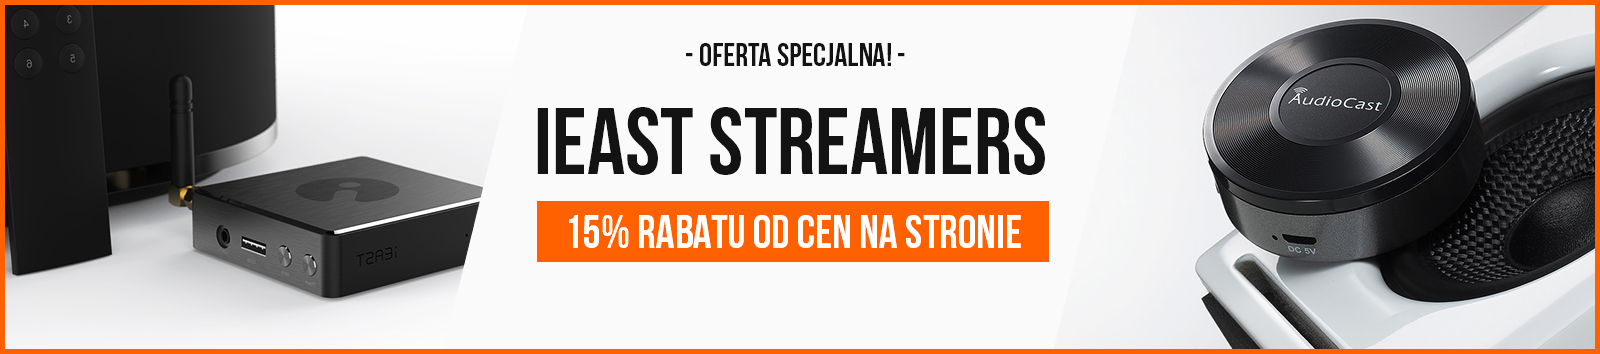 ieast streamers